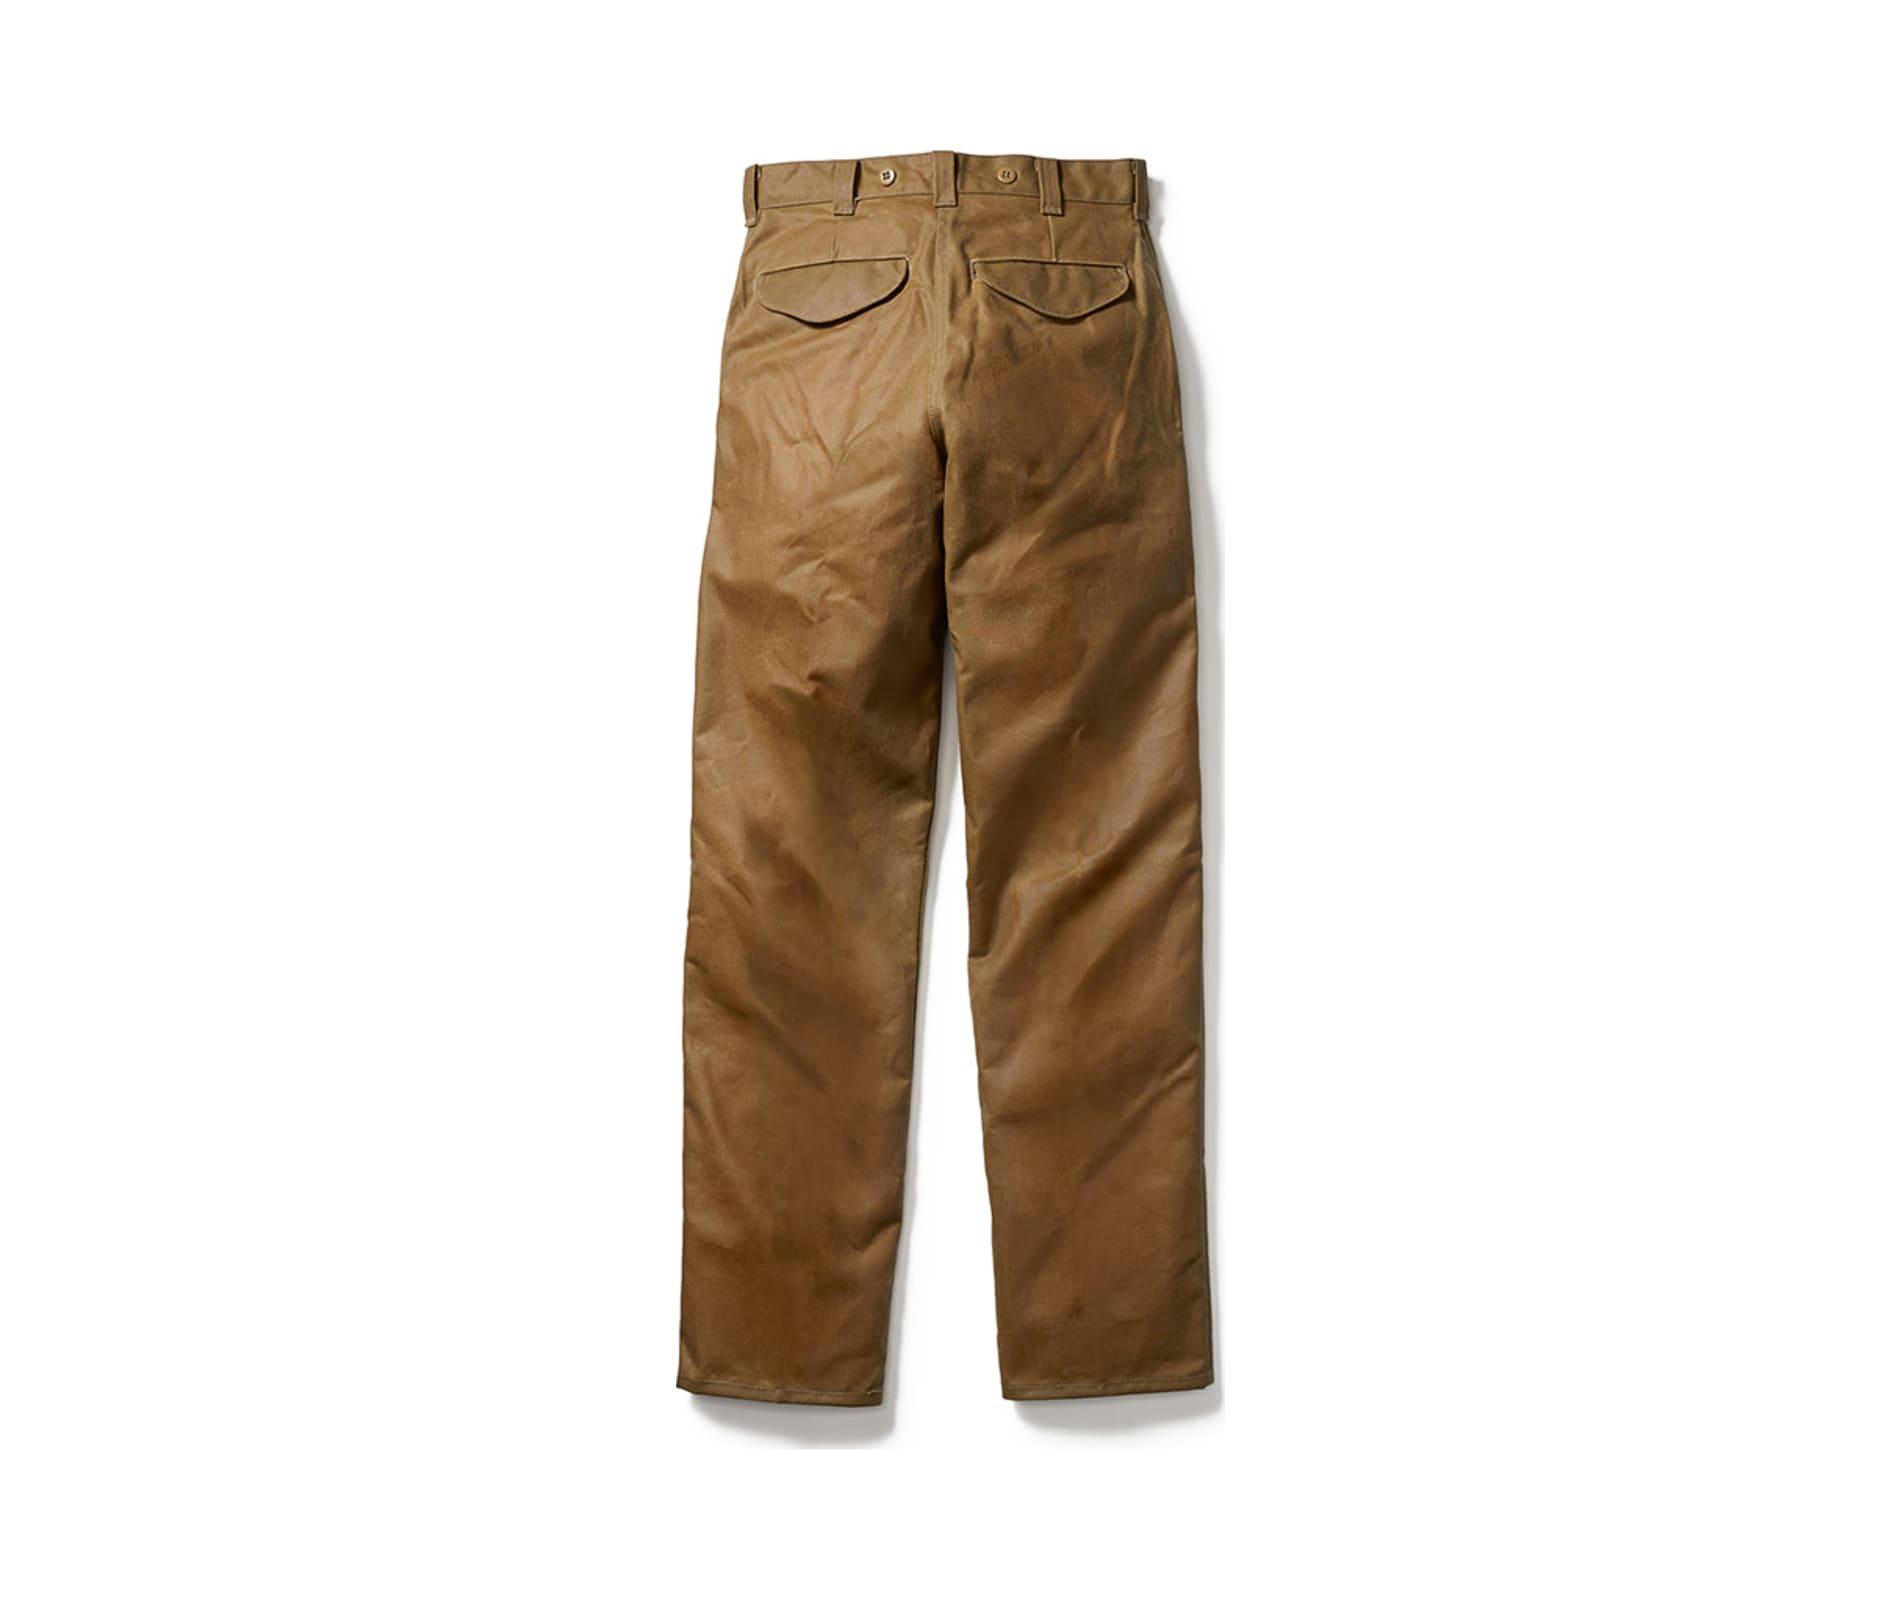 Filson oil finish single tin pants